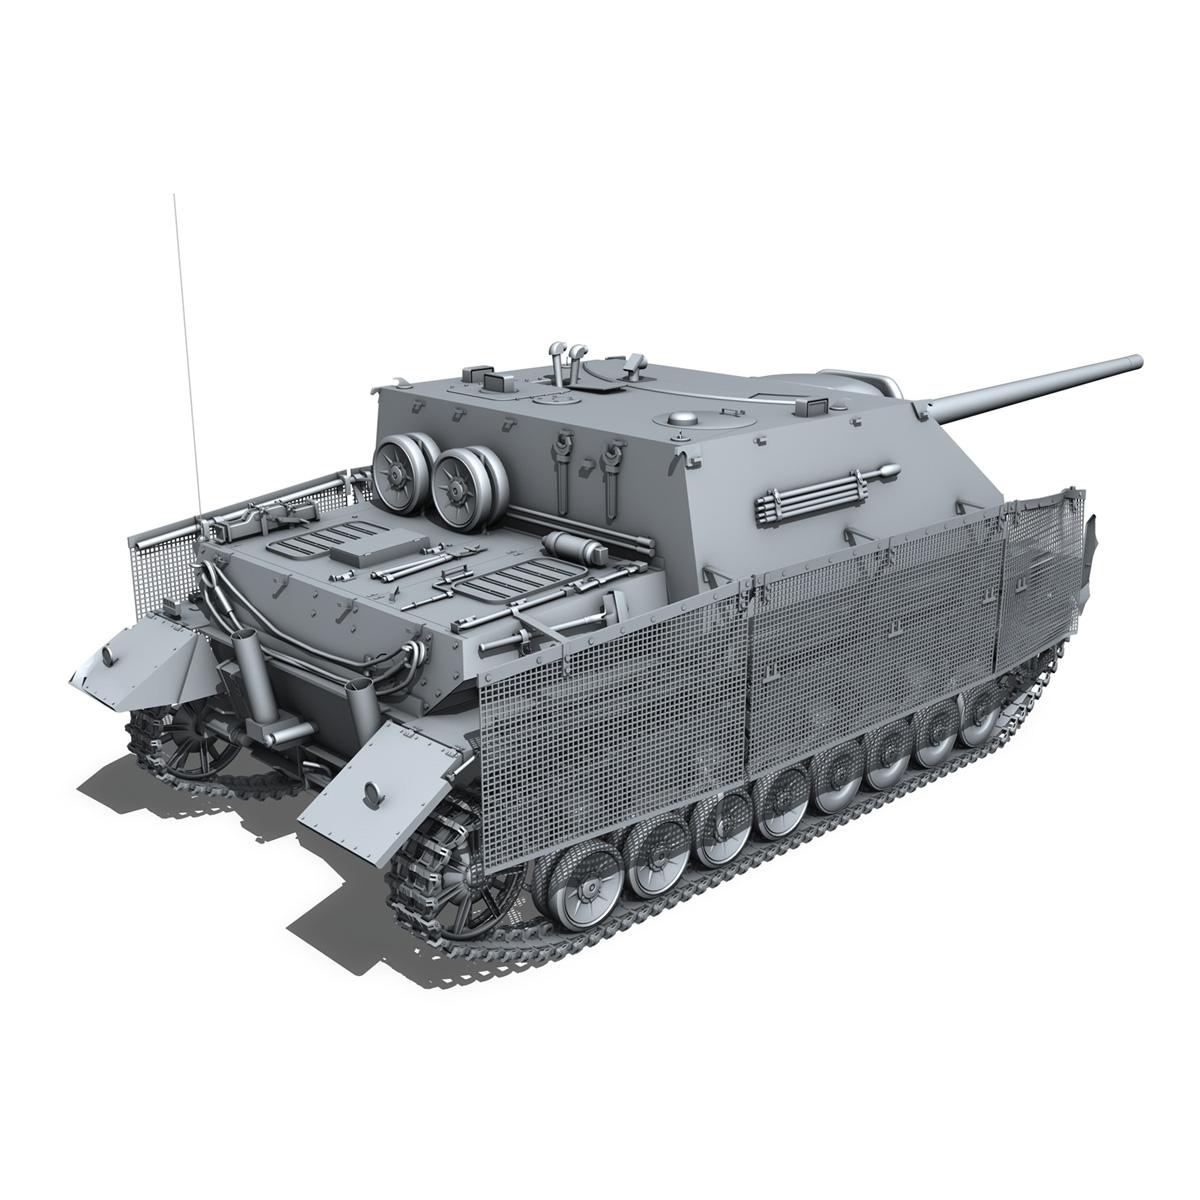 jagdpanzer iv l/70 (a) – sd.kfz 162/1 3d model 3ds fbx c4d lwo obj 202011